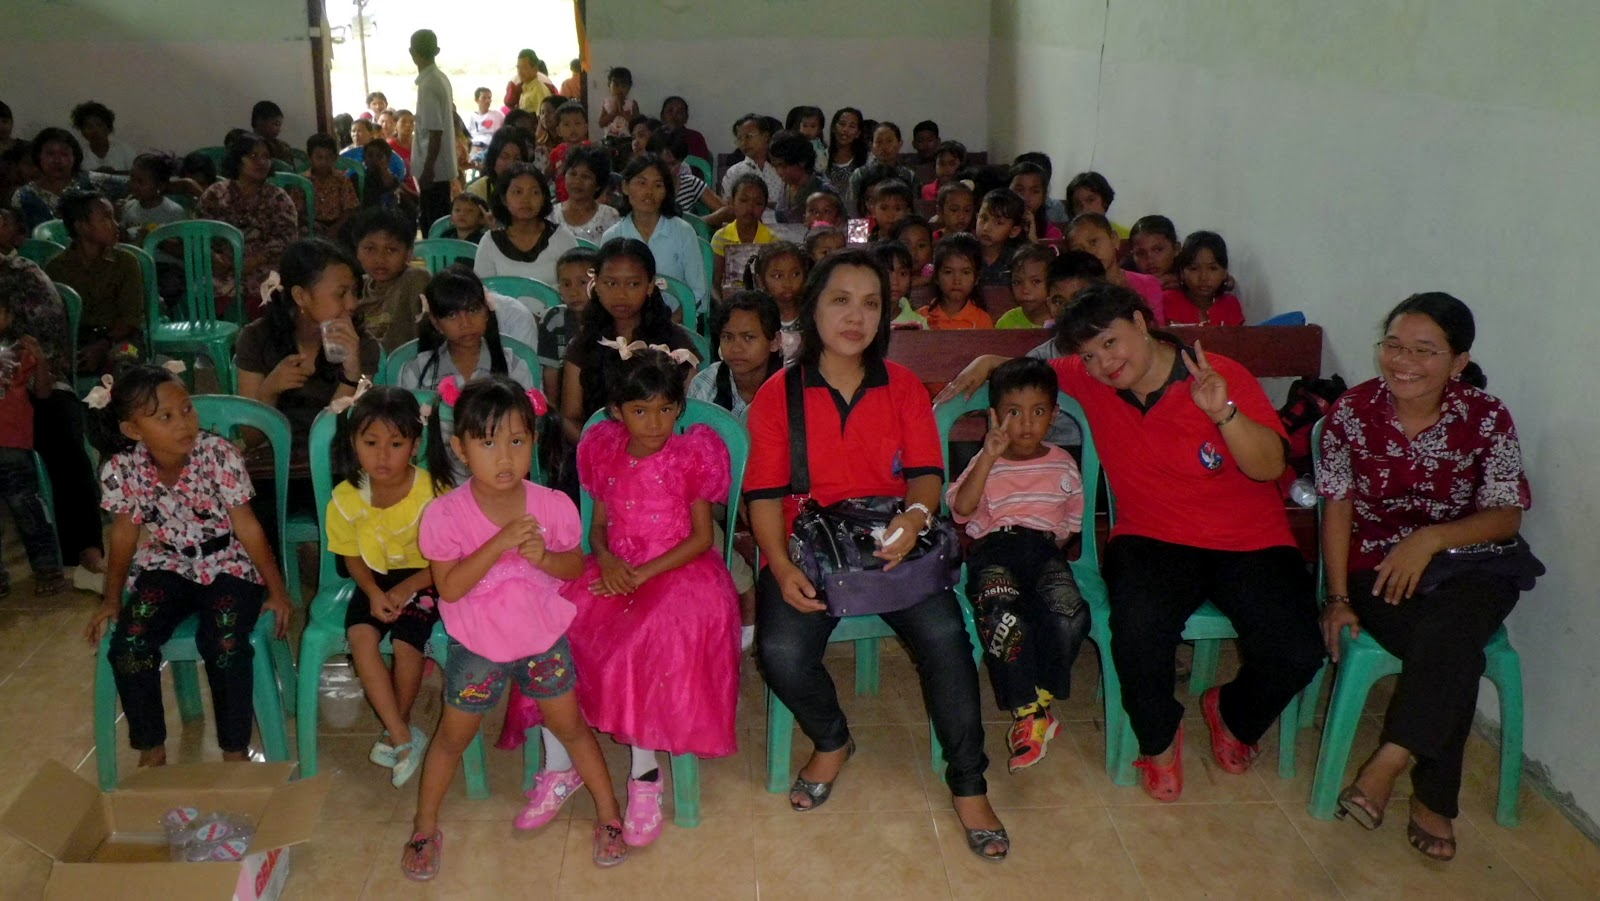 anak Sekolah Minggu di barisan bangku kanan juga siap merayakan Natal